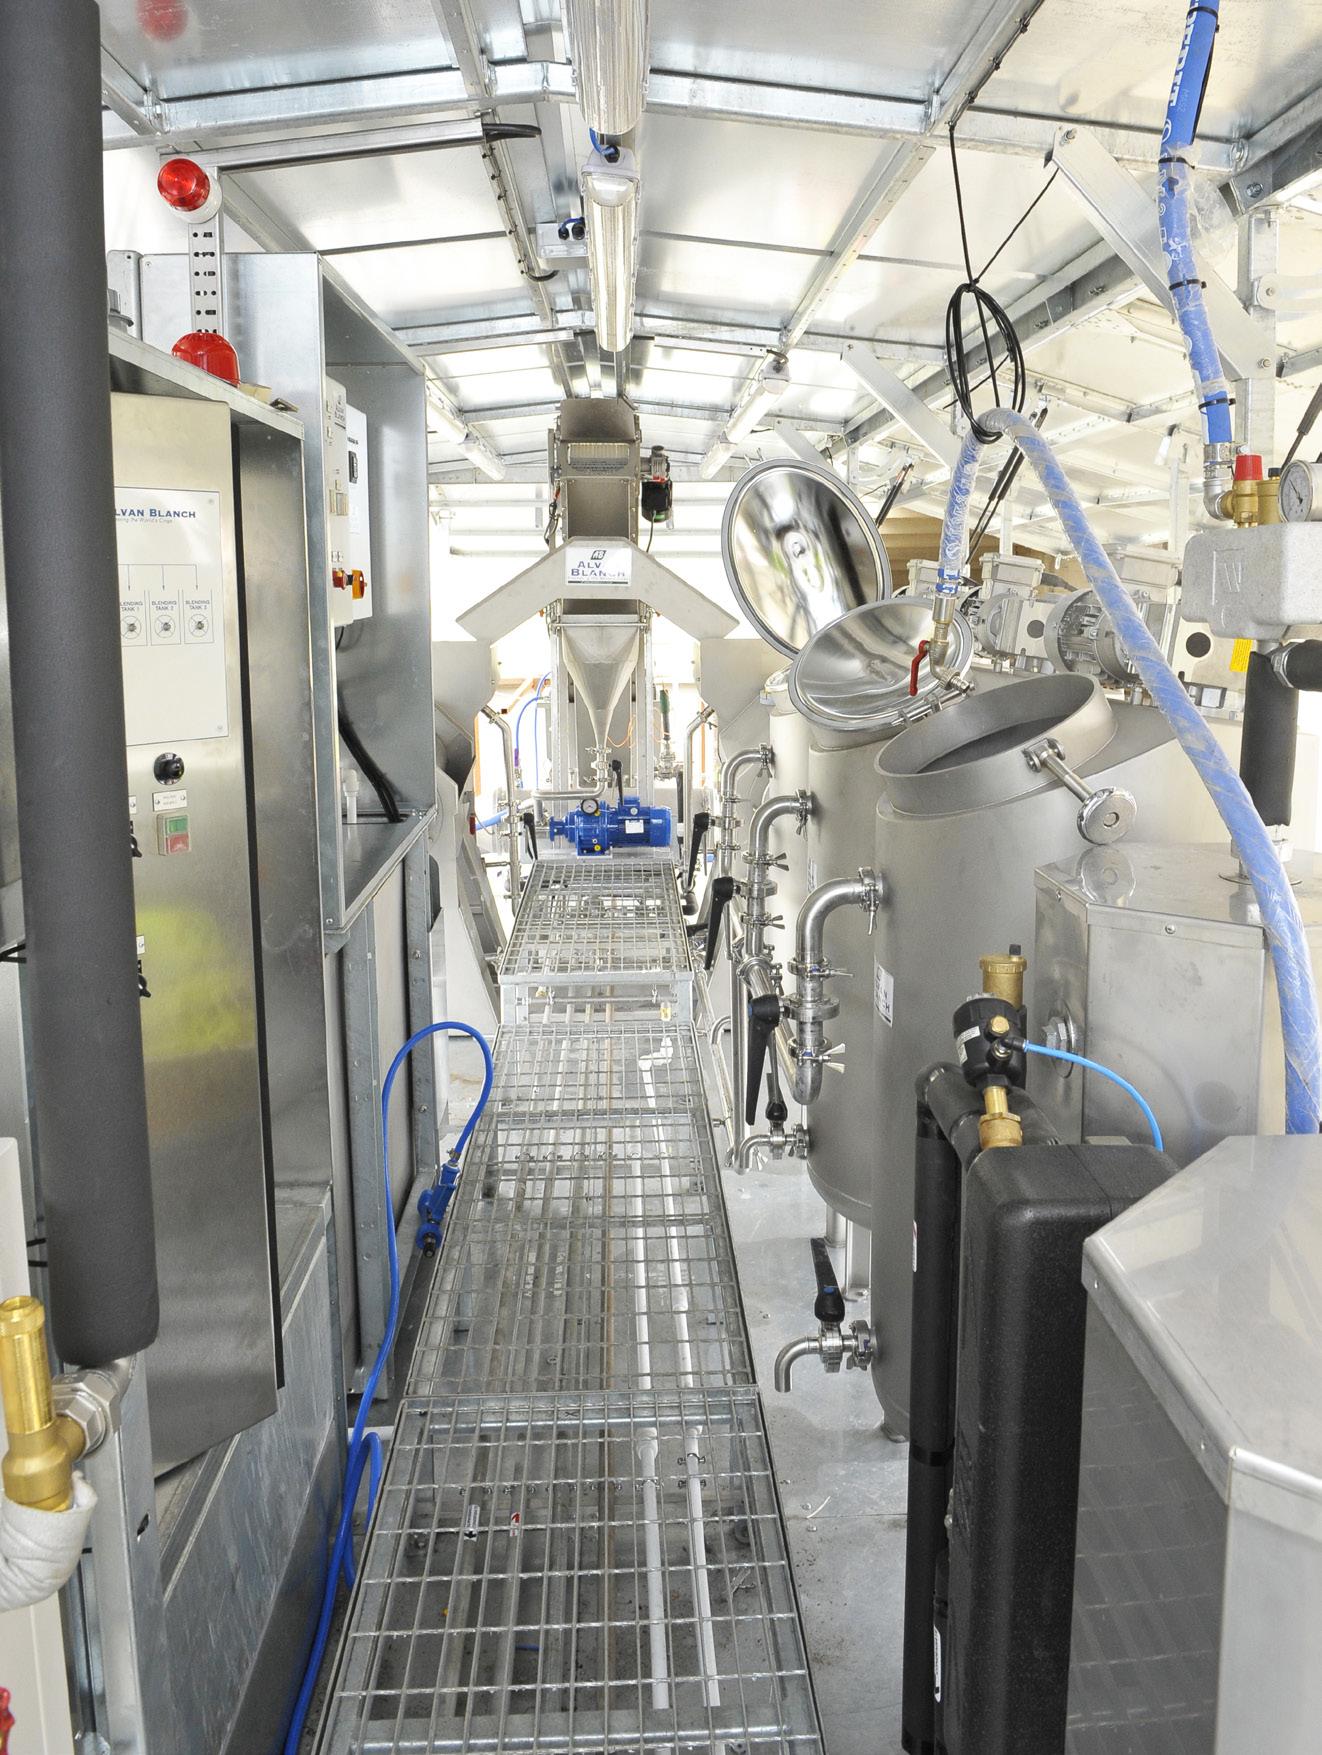 Alvan Blanch Mobile Fruit Juice Processing System Nigeria Page 3 Image 0006